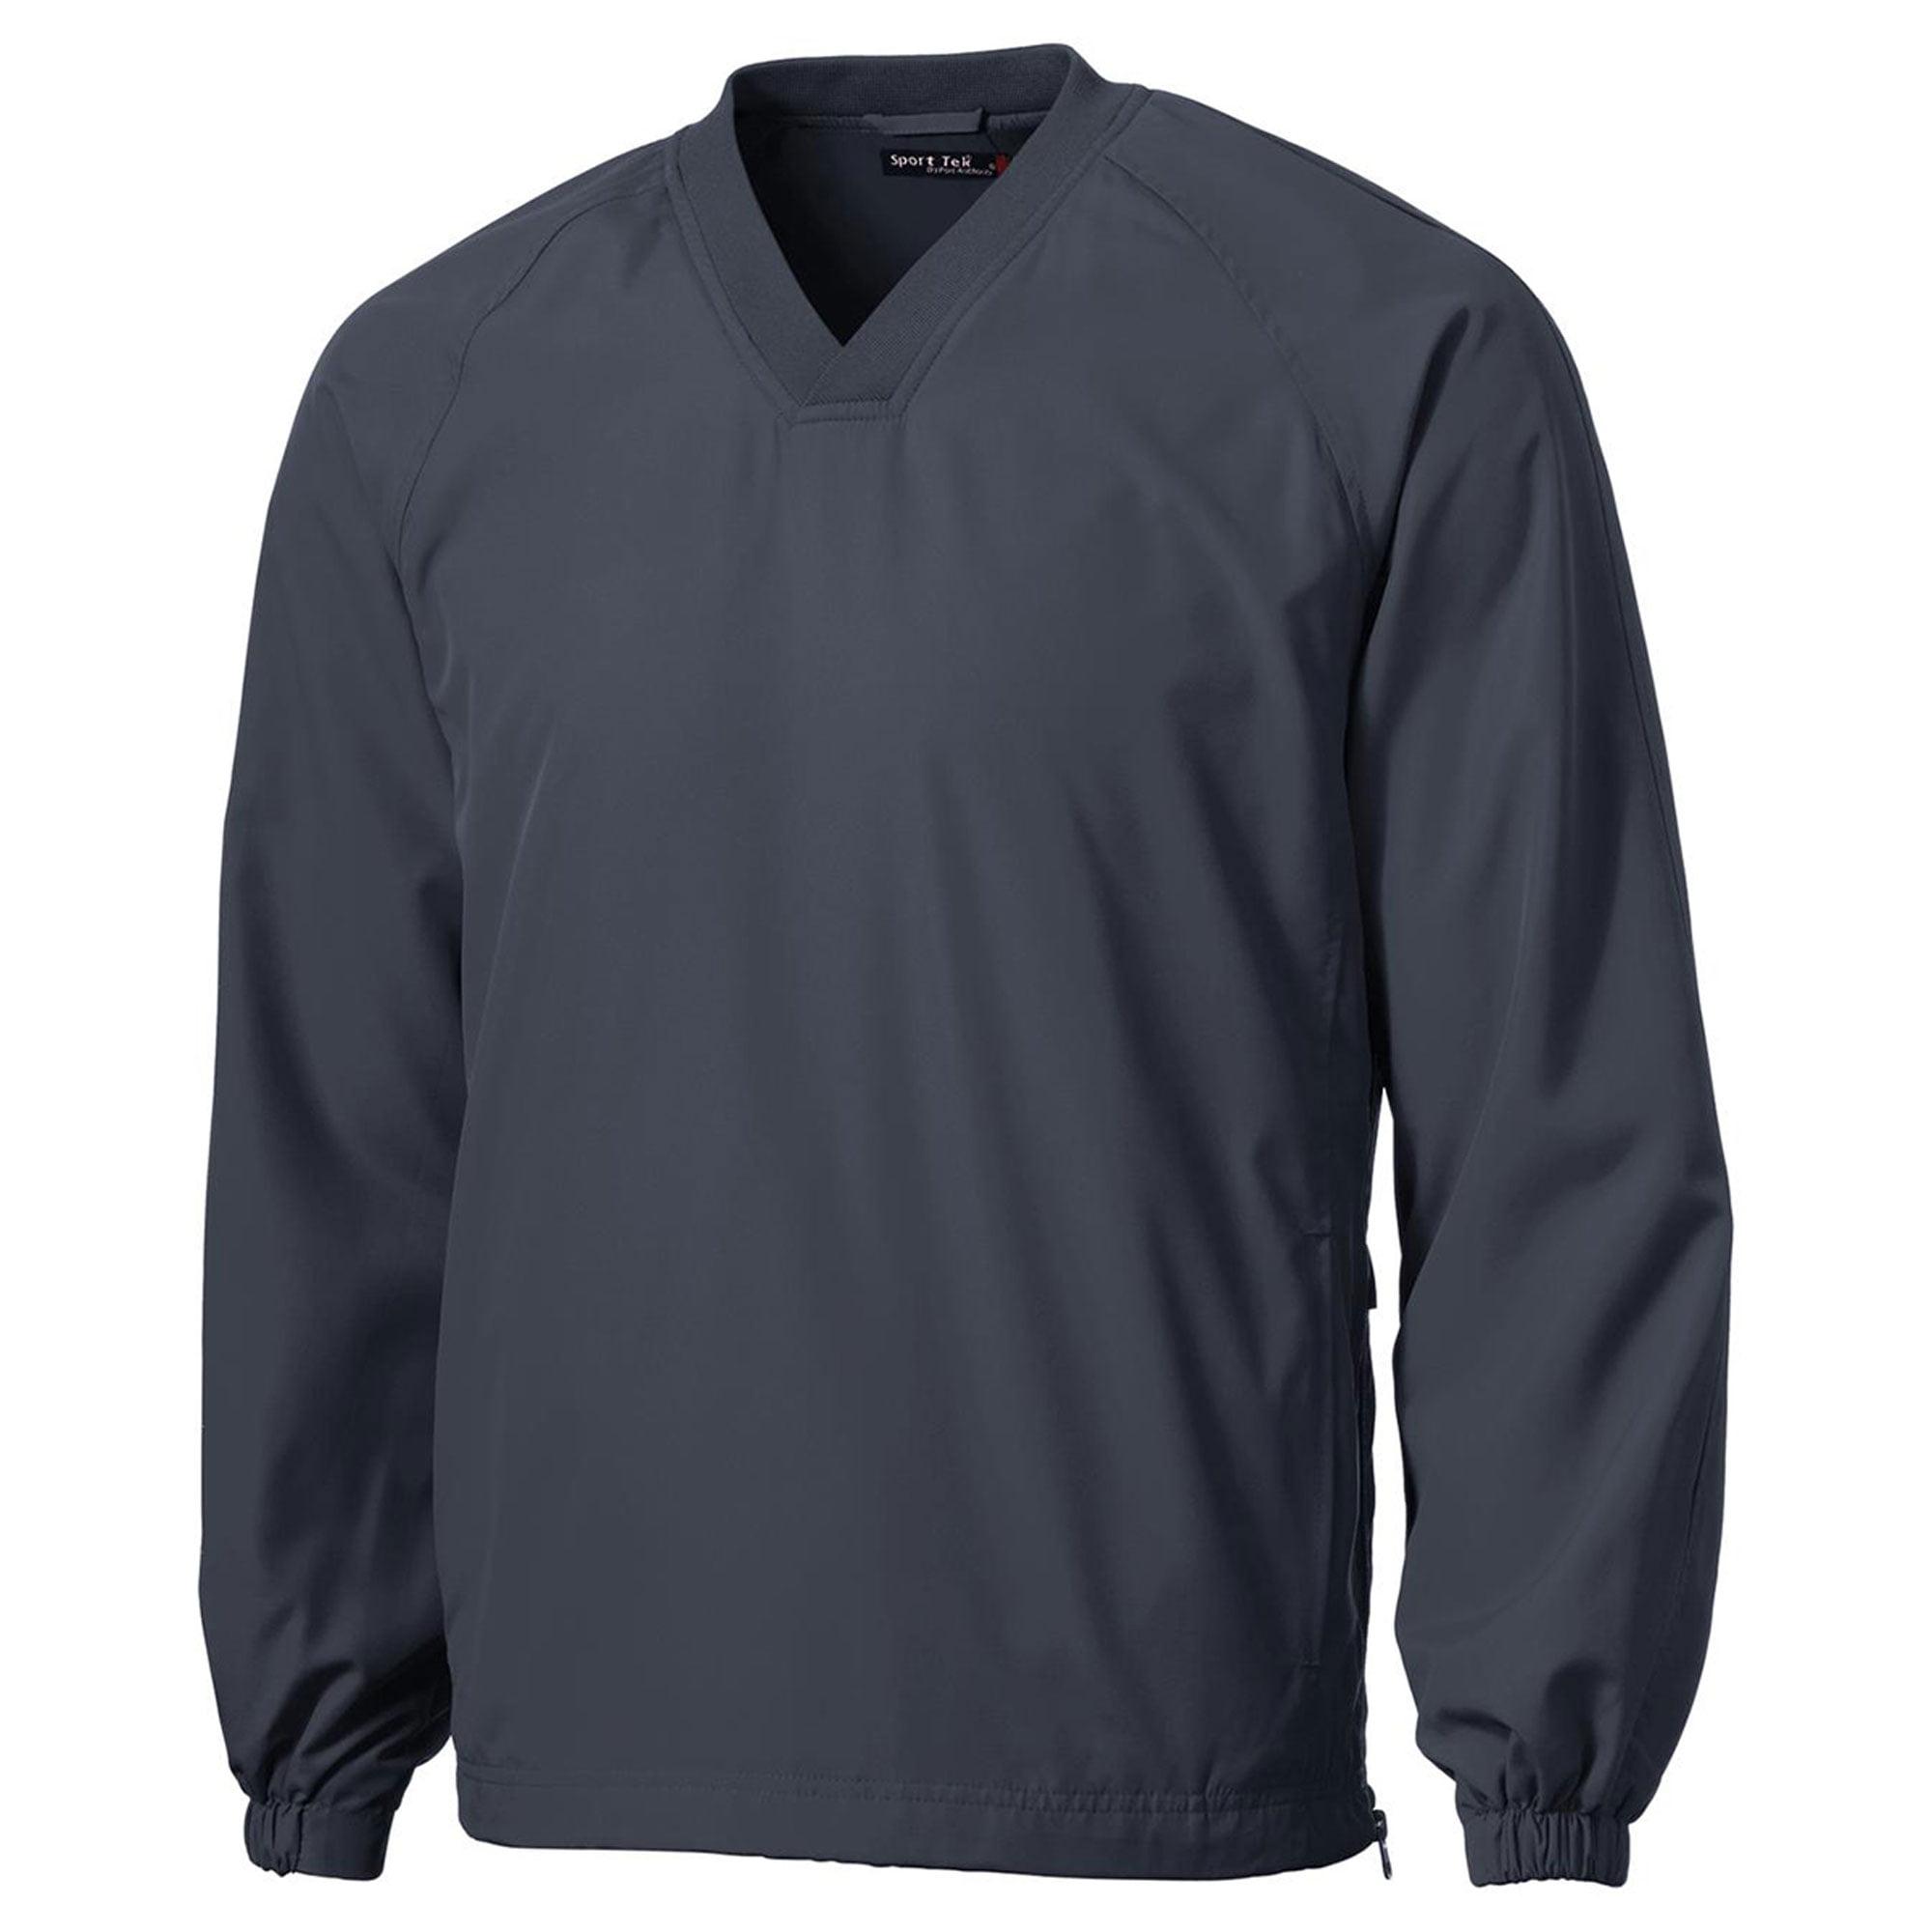 Sport-Tek Men's Rib Knit V-Neck Collar Soft Raglan Wind Shirt